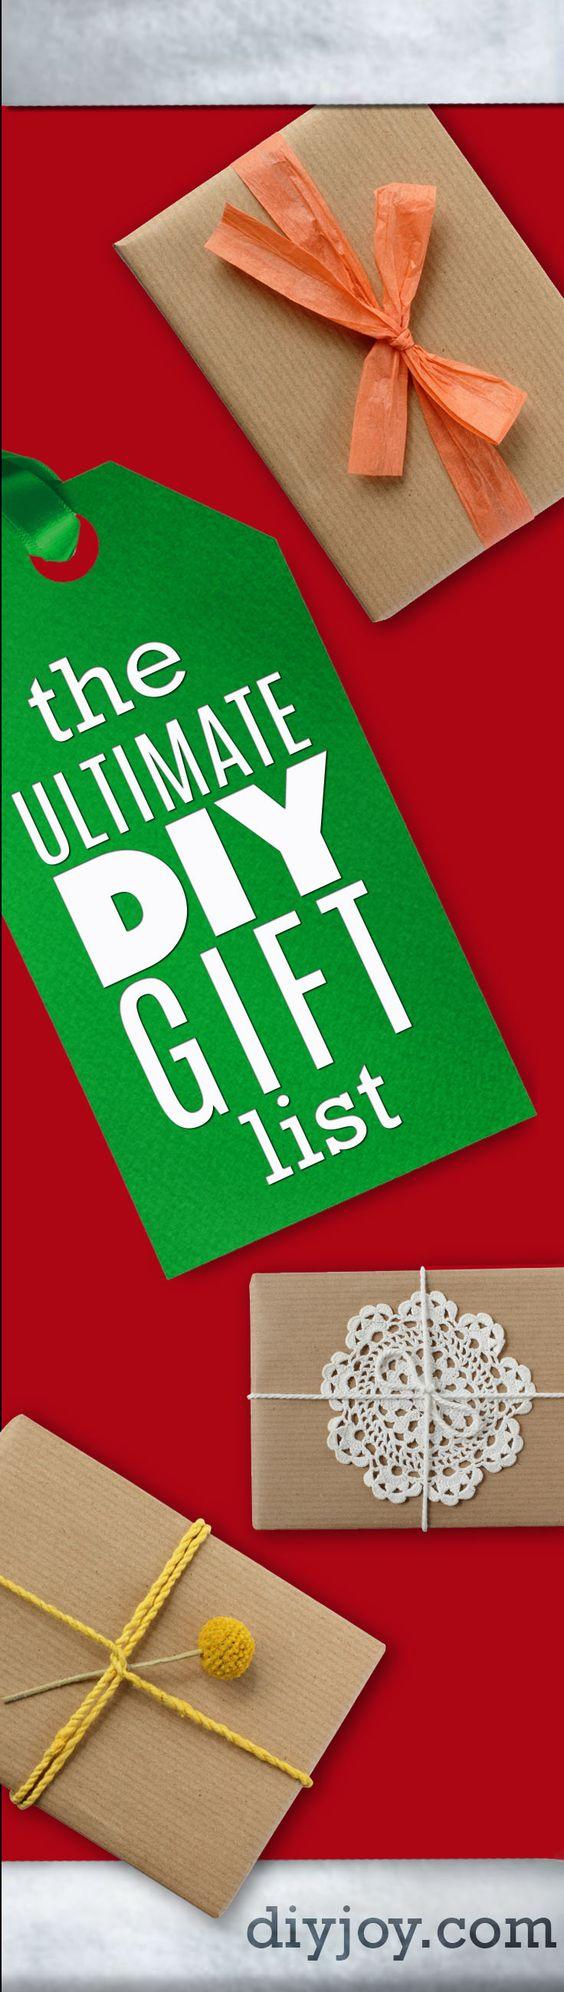 Diy christmas gifts homemade and gifts on pinterest for Homemade christmas gifts for friends